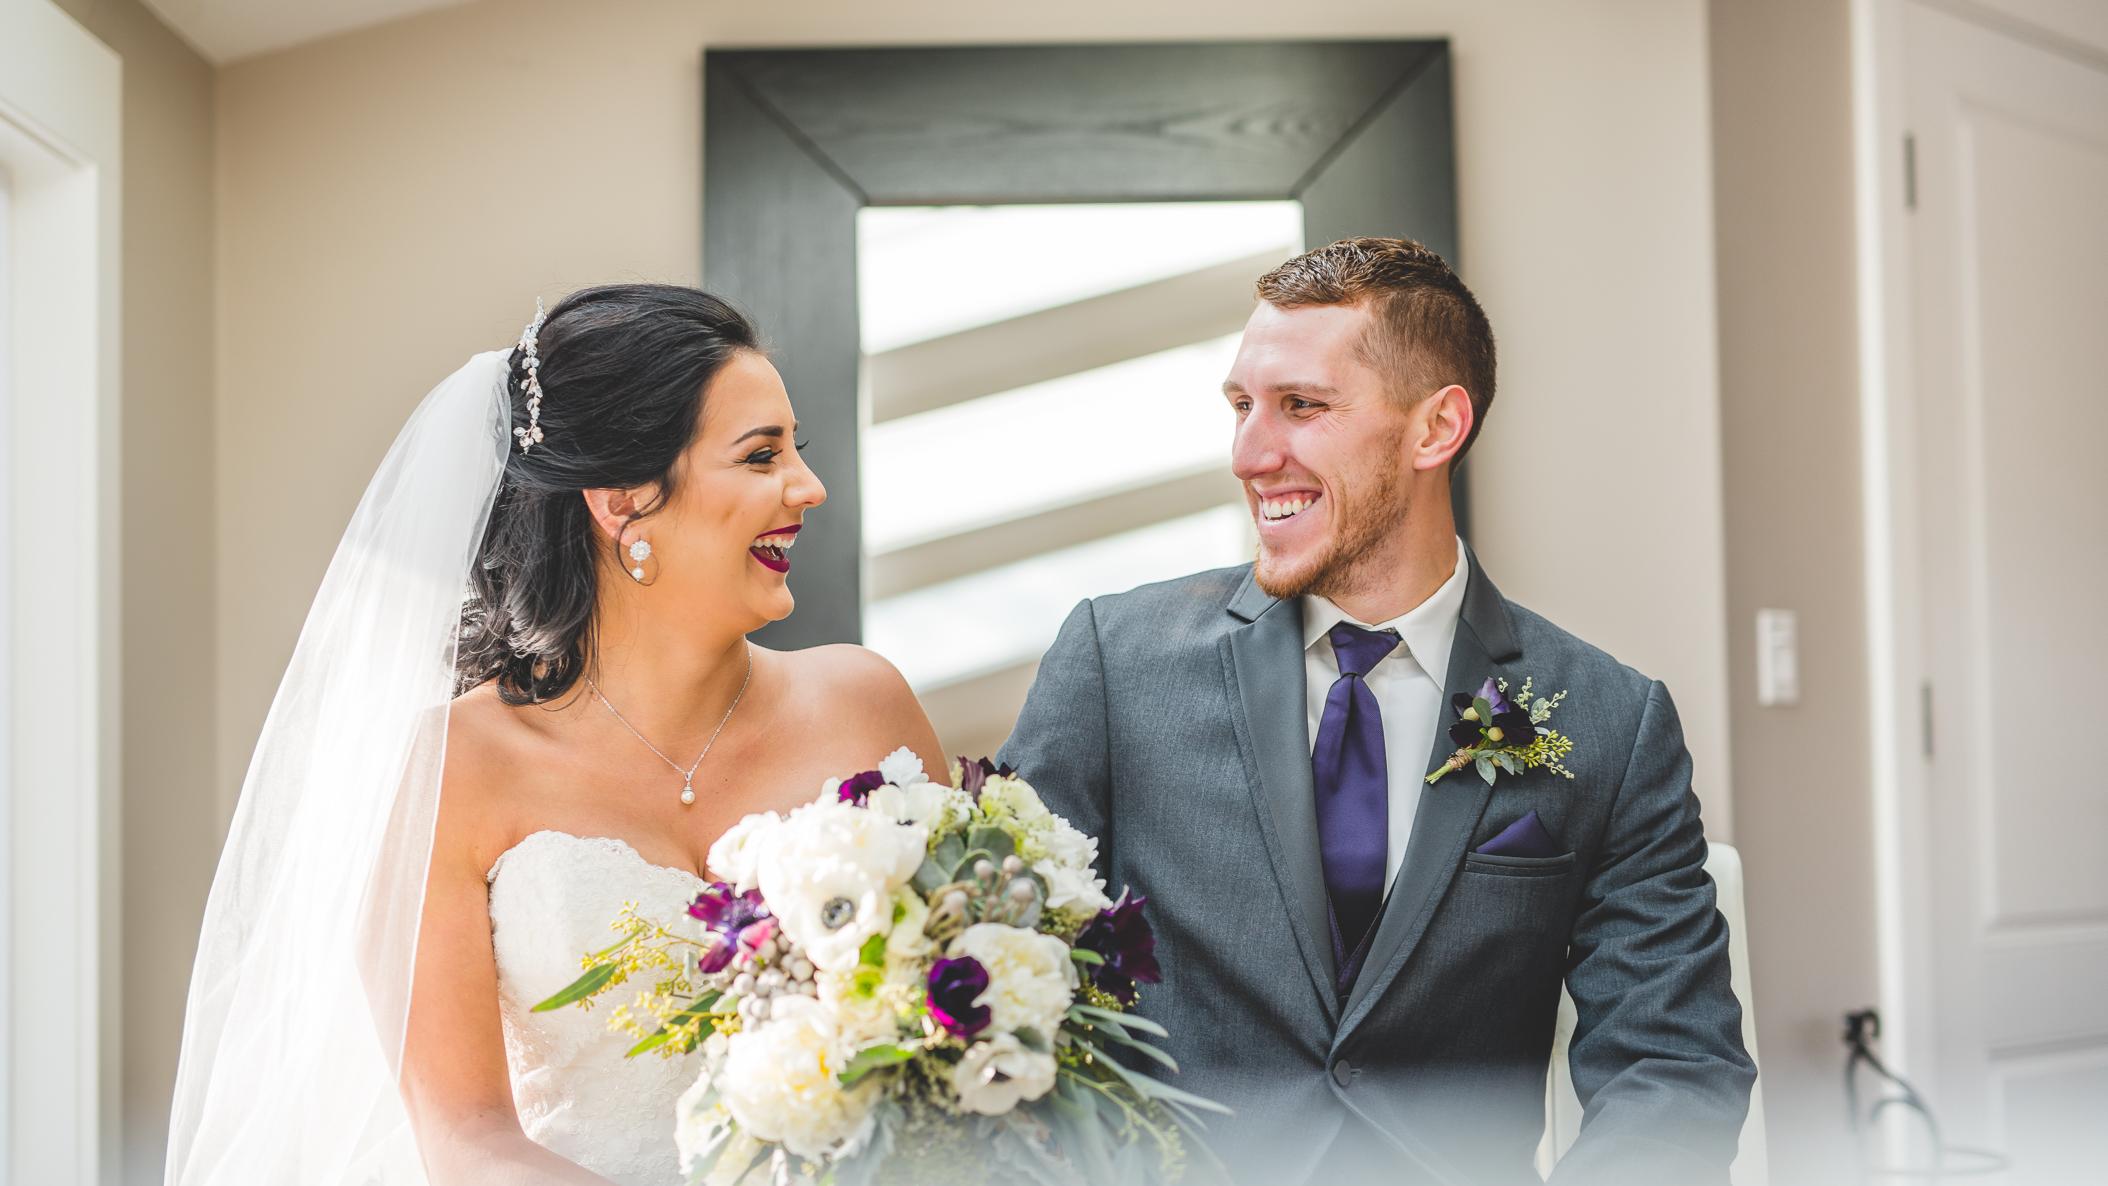 Grace & Ben Wedding Preview - Dustin Morrison Photography-9.jpg